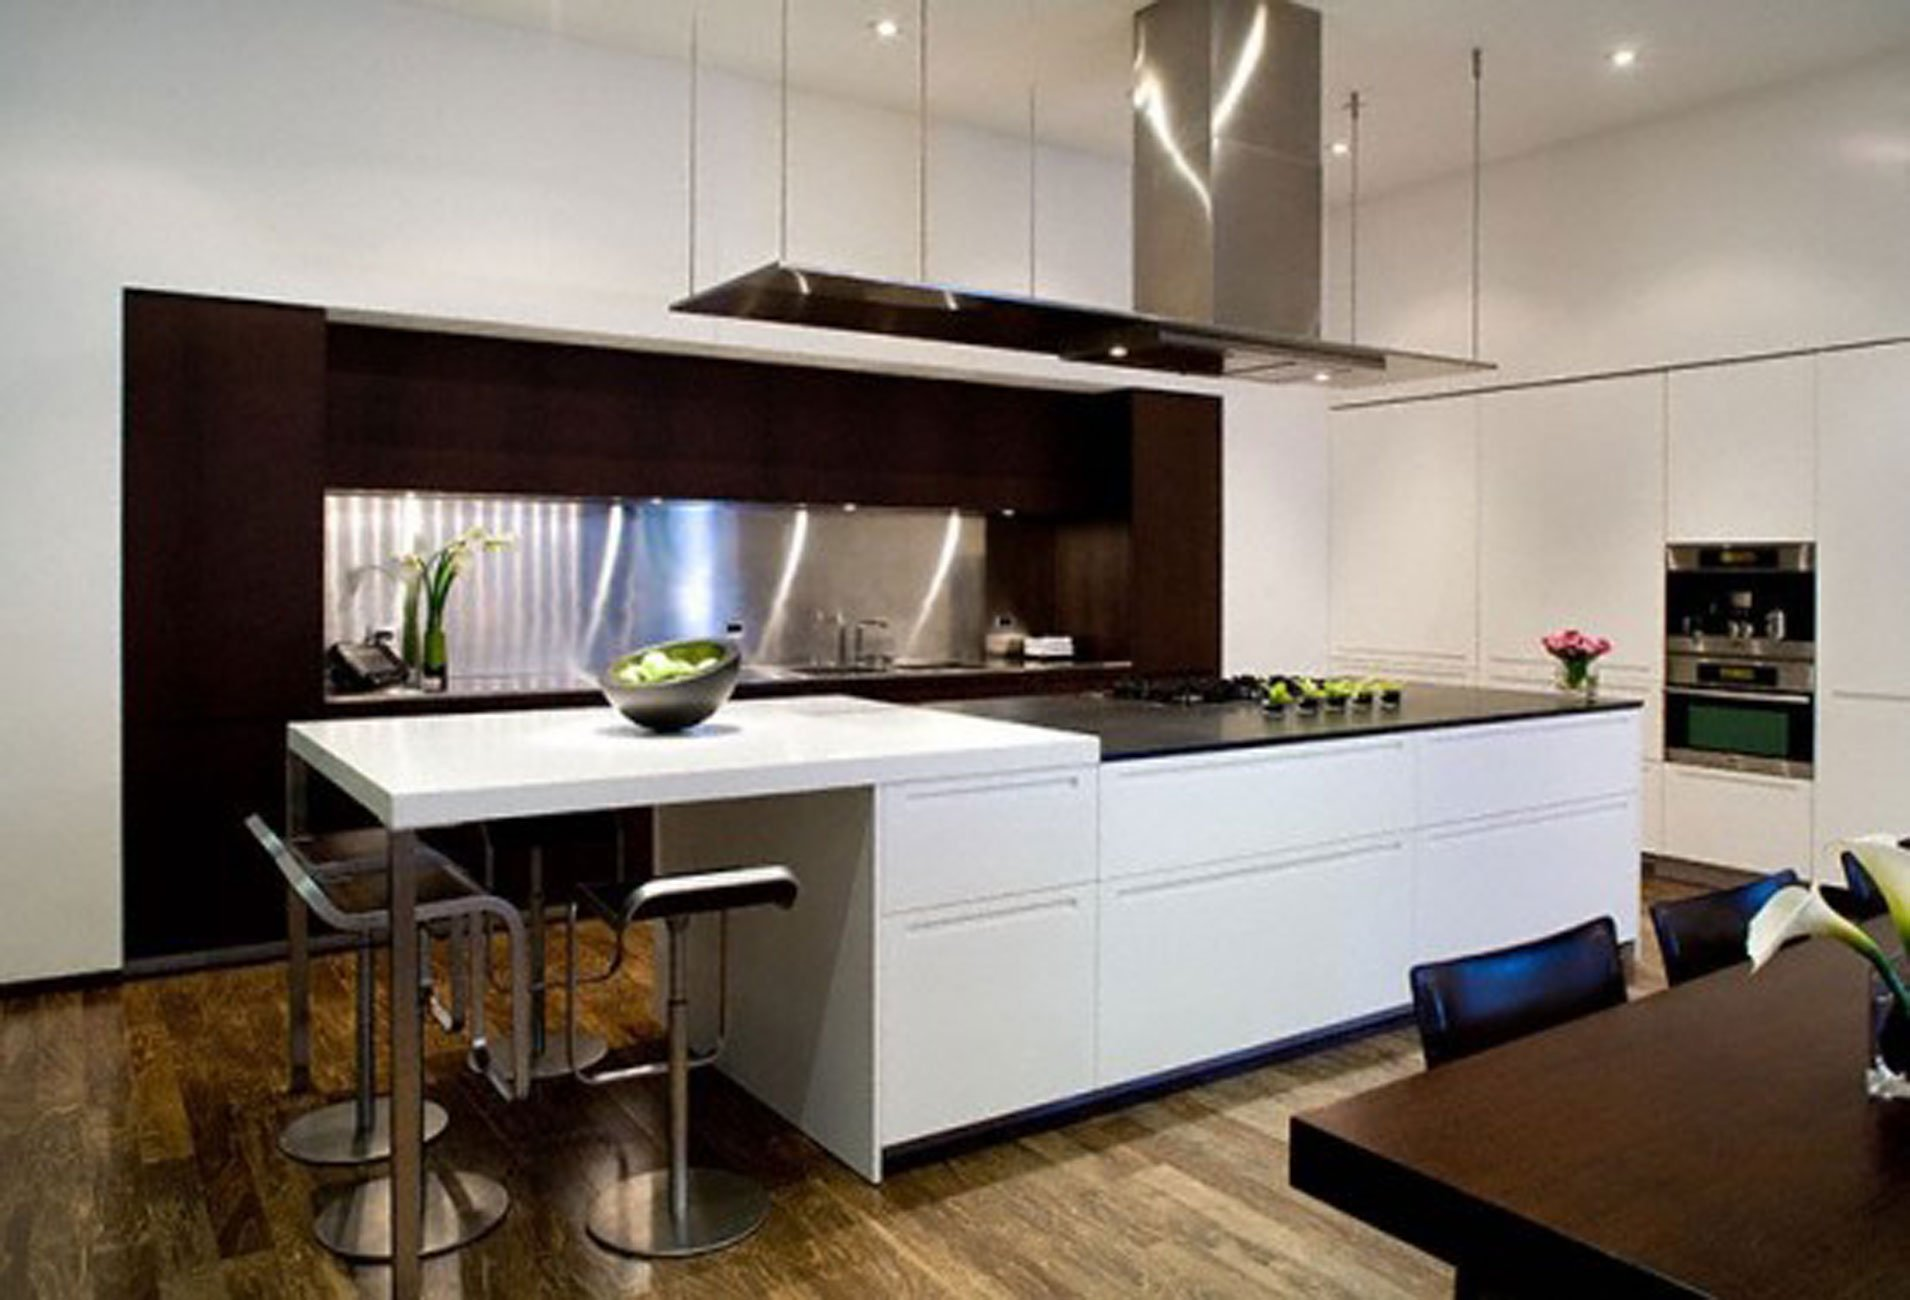 office chairs zimbabwe swivel for sale modern kitchen interior designs | homesfeed